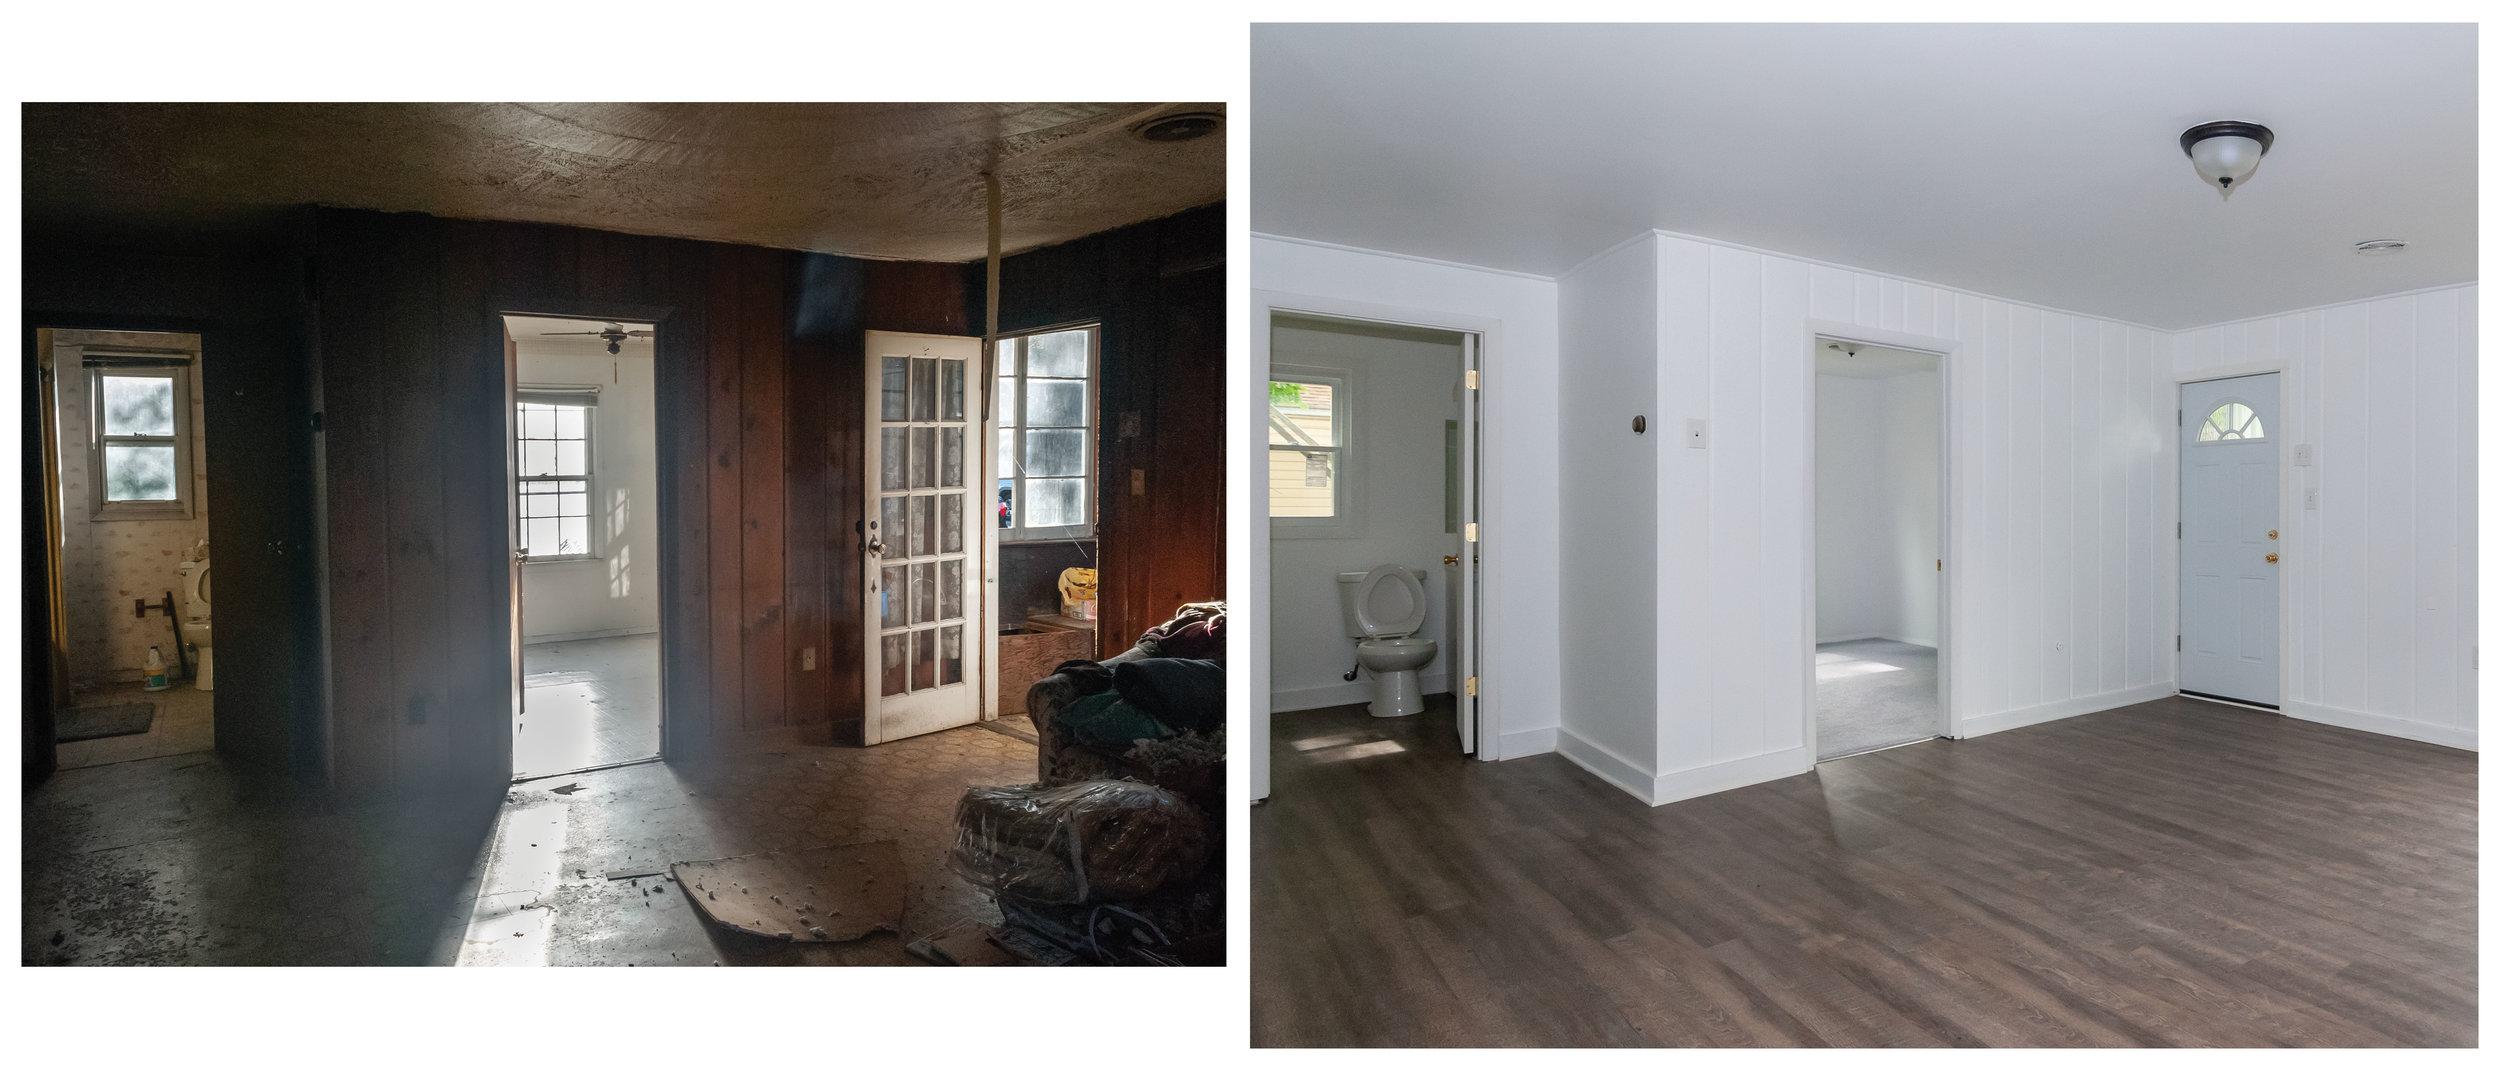 Fairmount living room 2 comparison.jpg